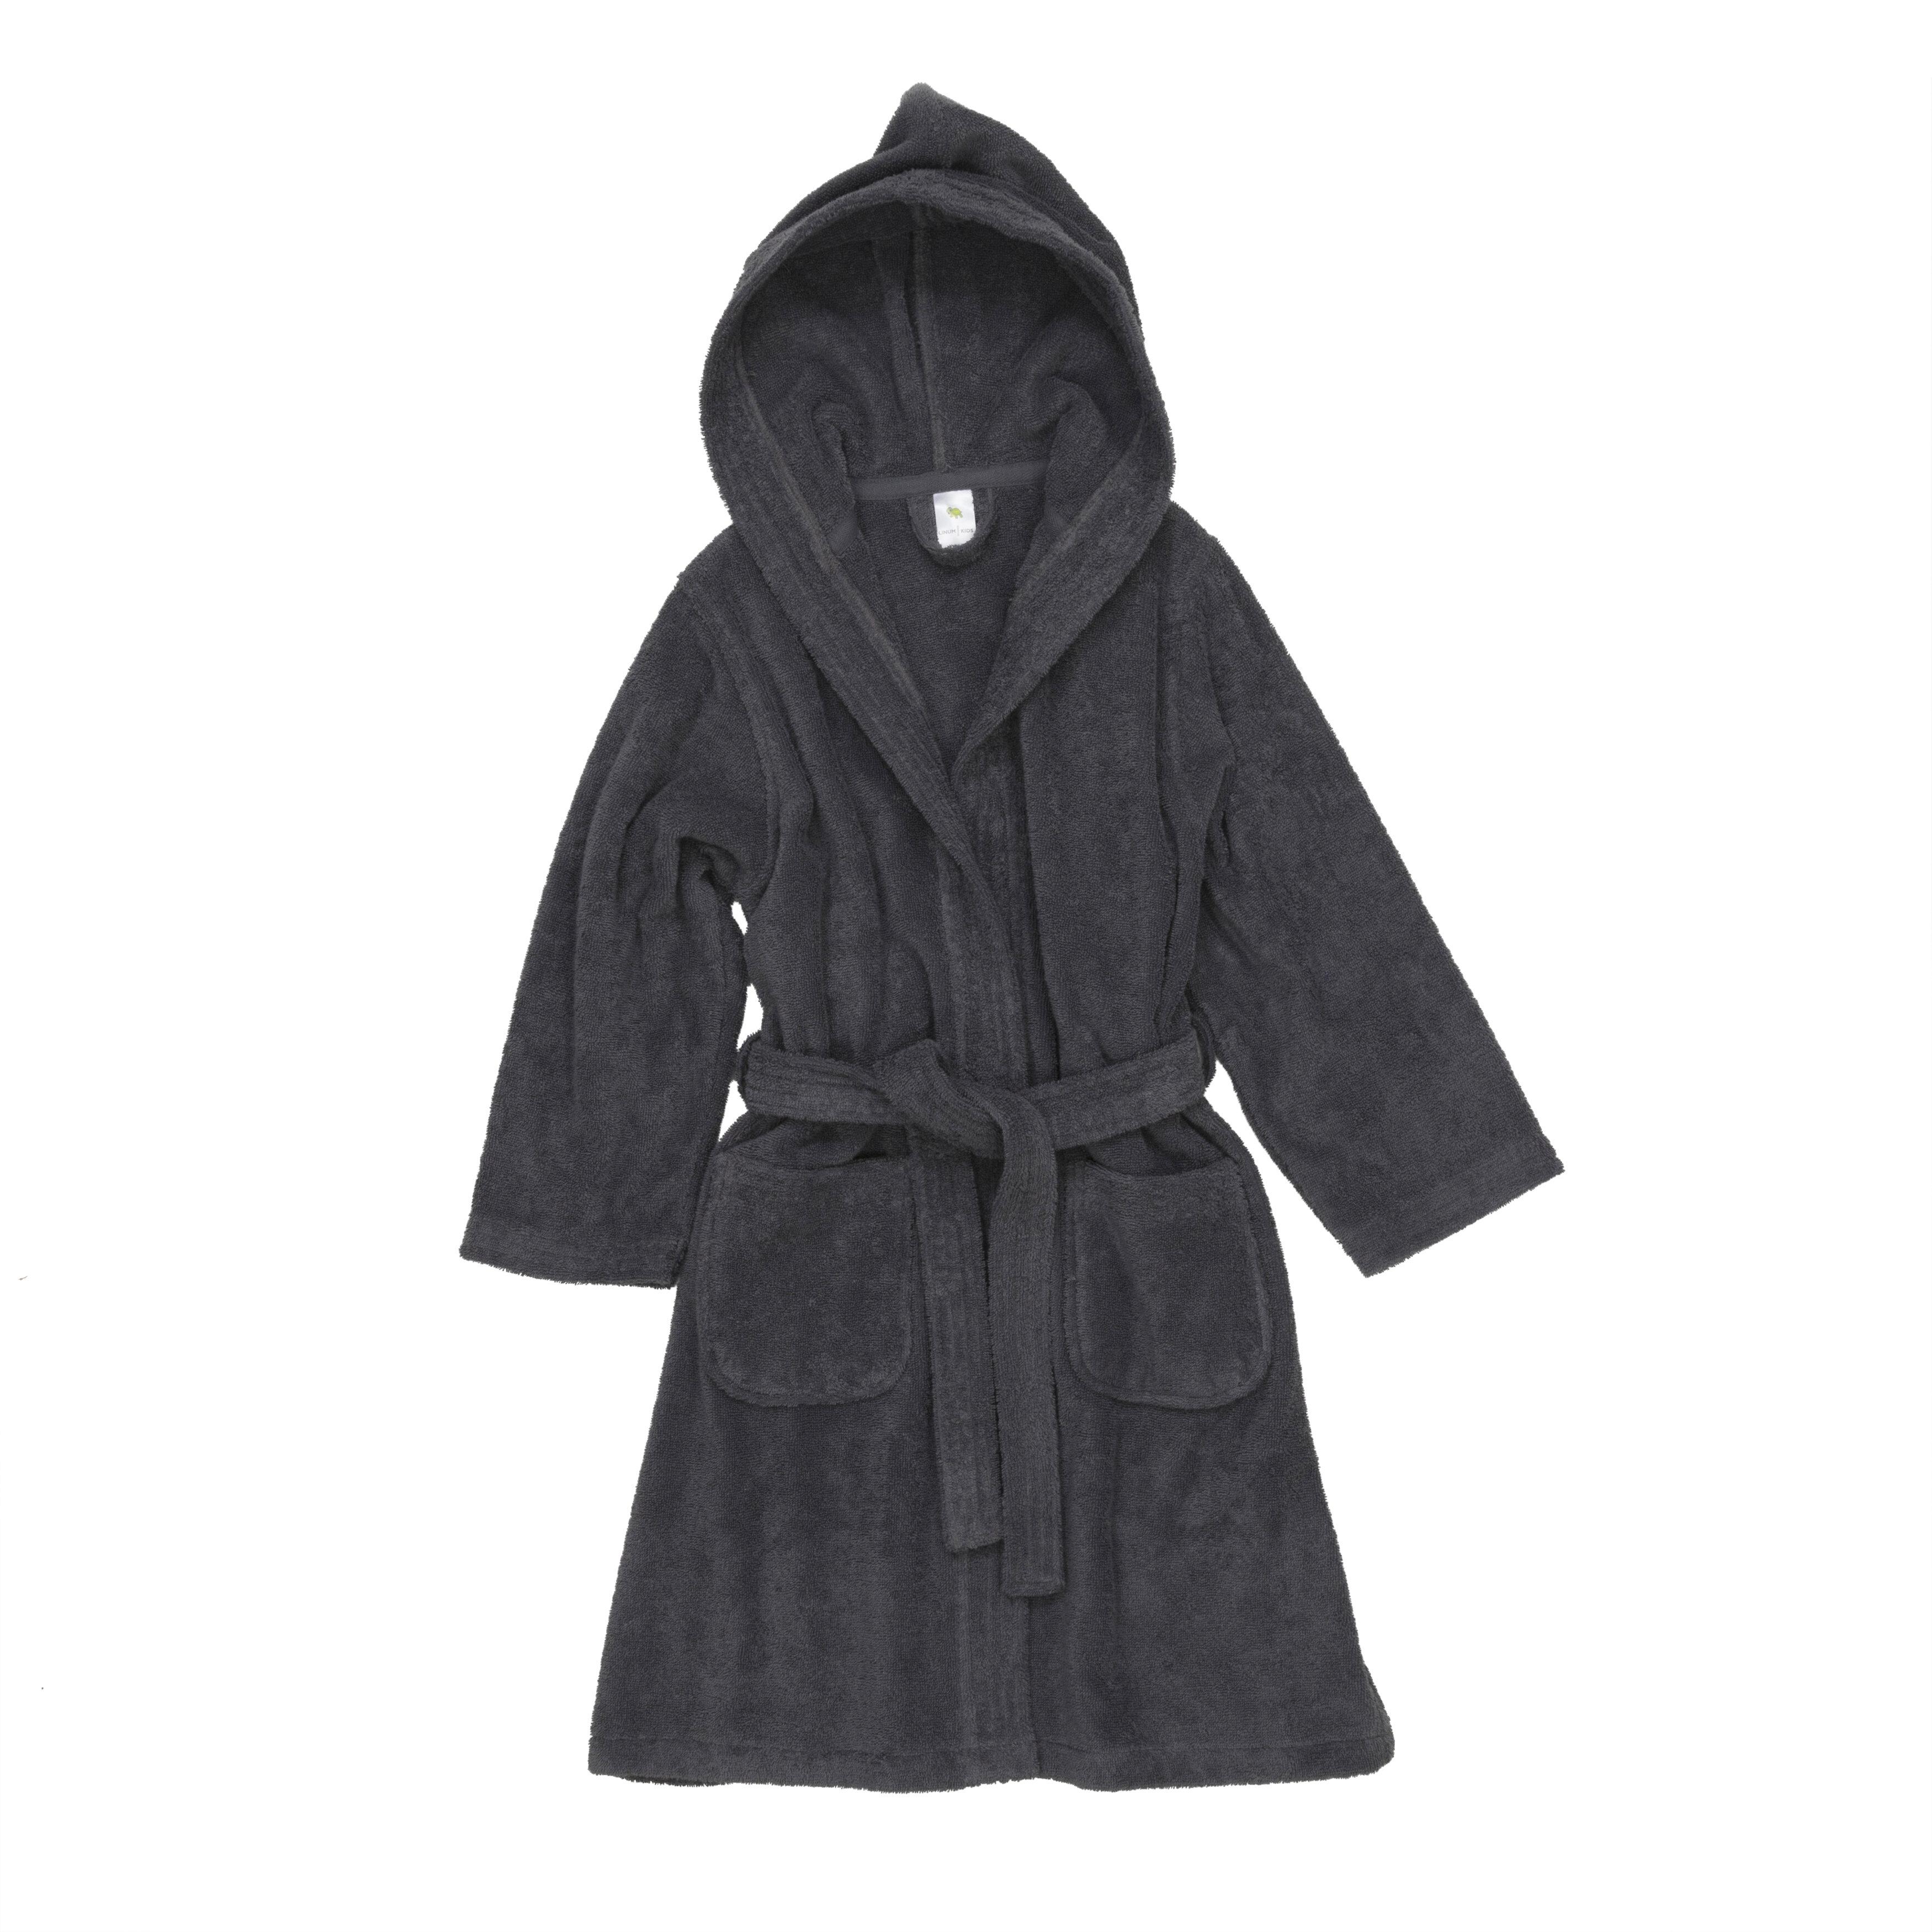 7a7d5c34c3 Harriet Bee Bernardini 100% Turkish Cotton Terry Cloth Bathrobe   Reviews